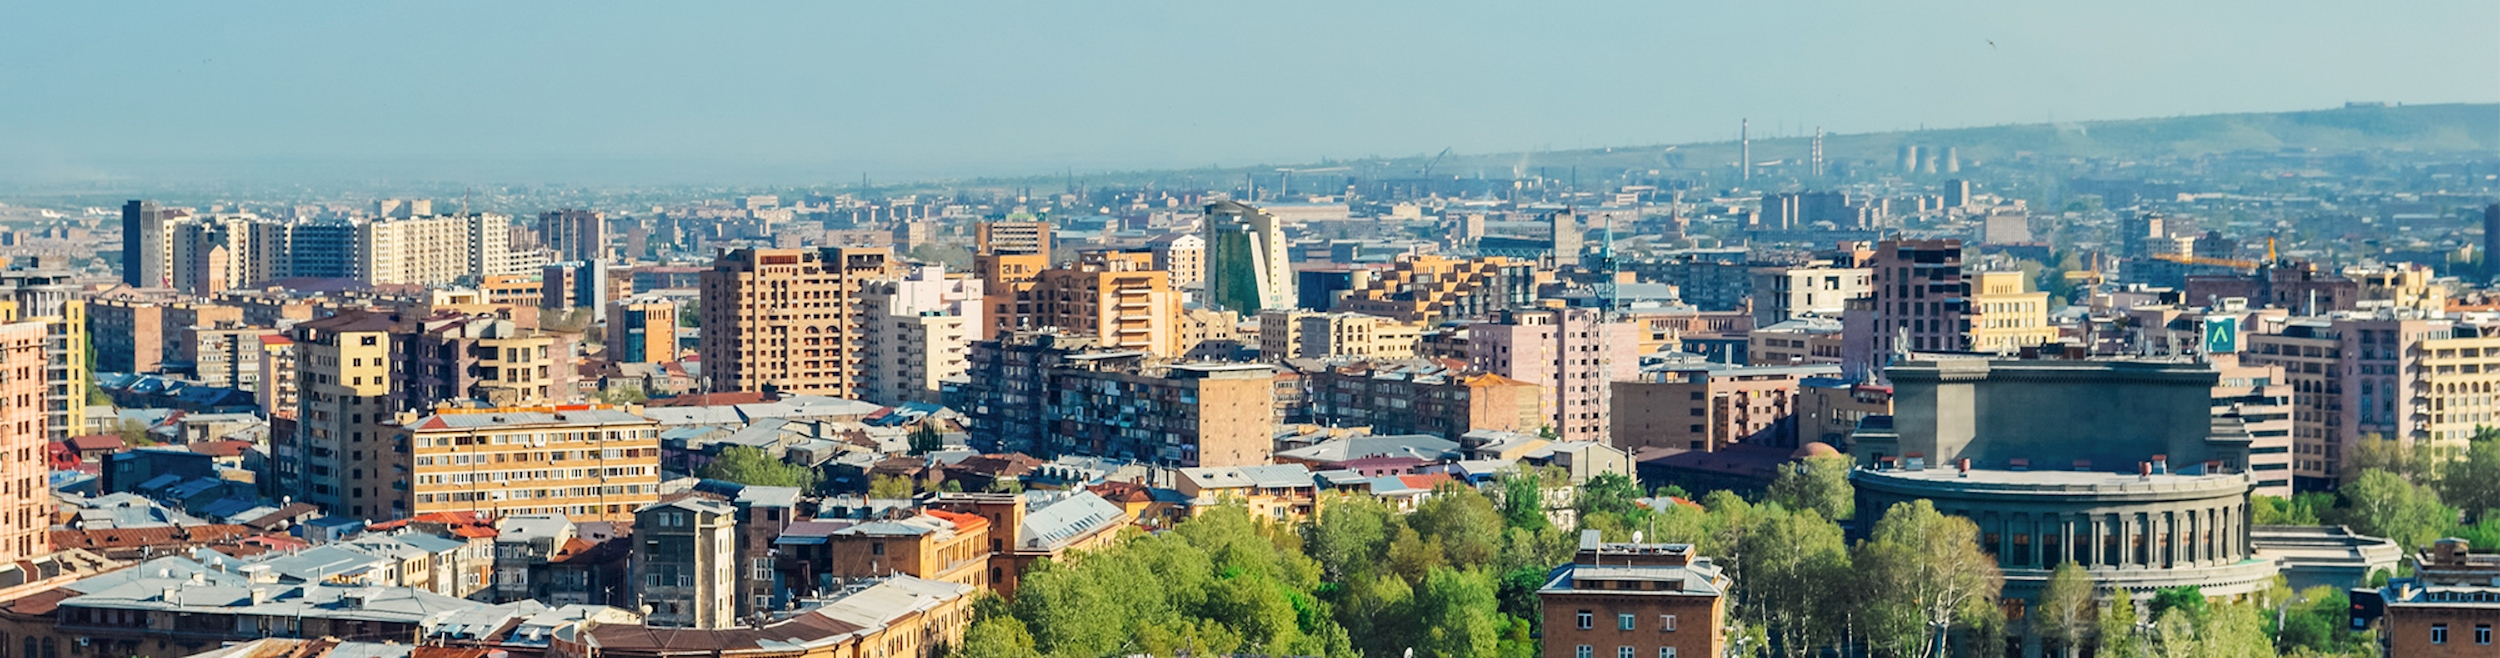 New Destination in Armenia : Yerevan